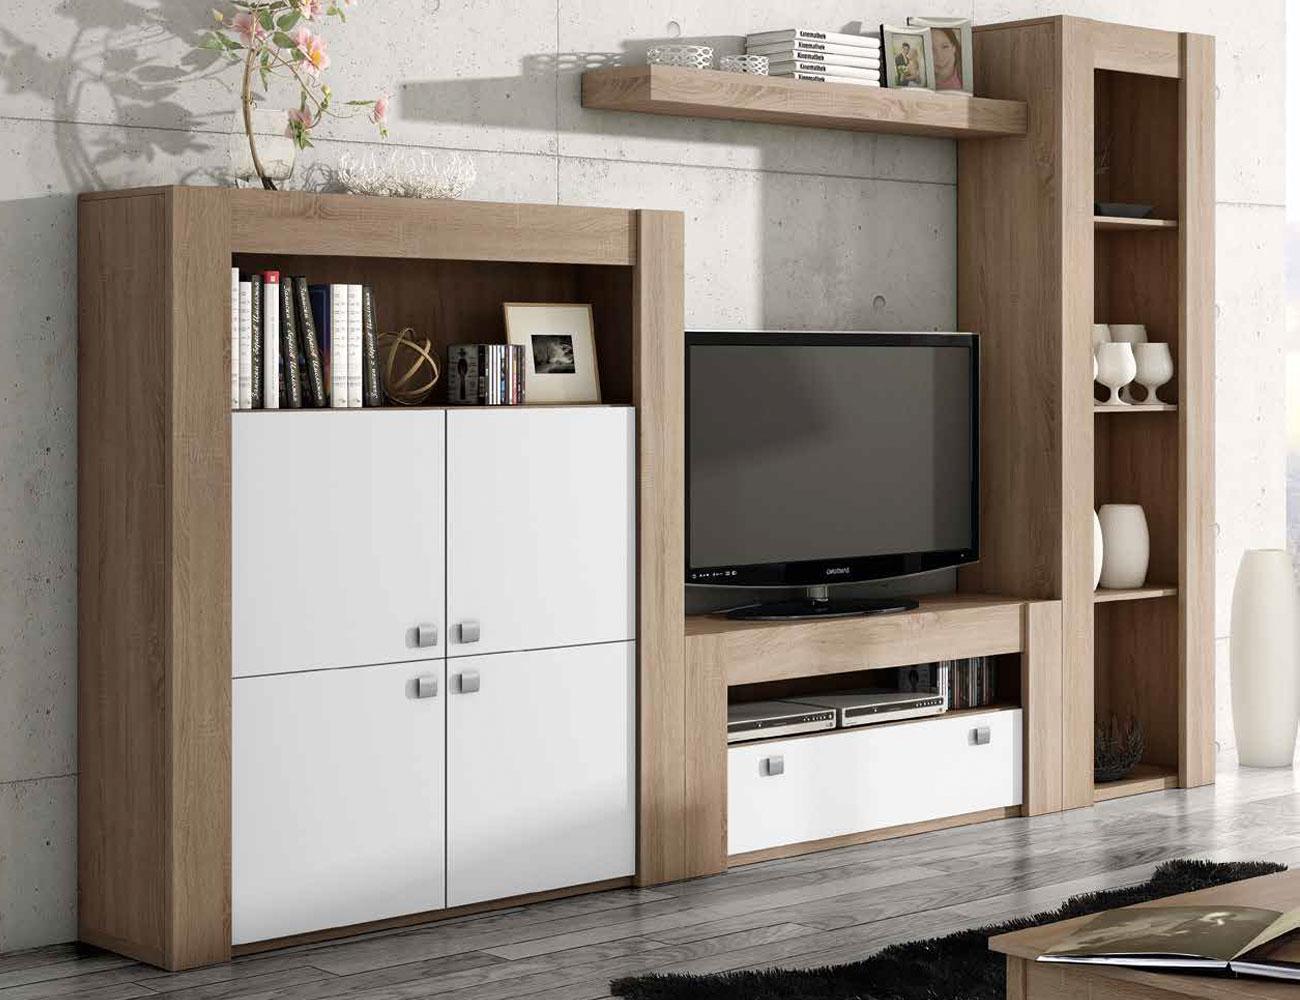 Mueble de sal n modular moderno en ceniza cambrian 2274 - Factory del mueble sevilla ...